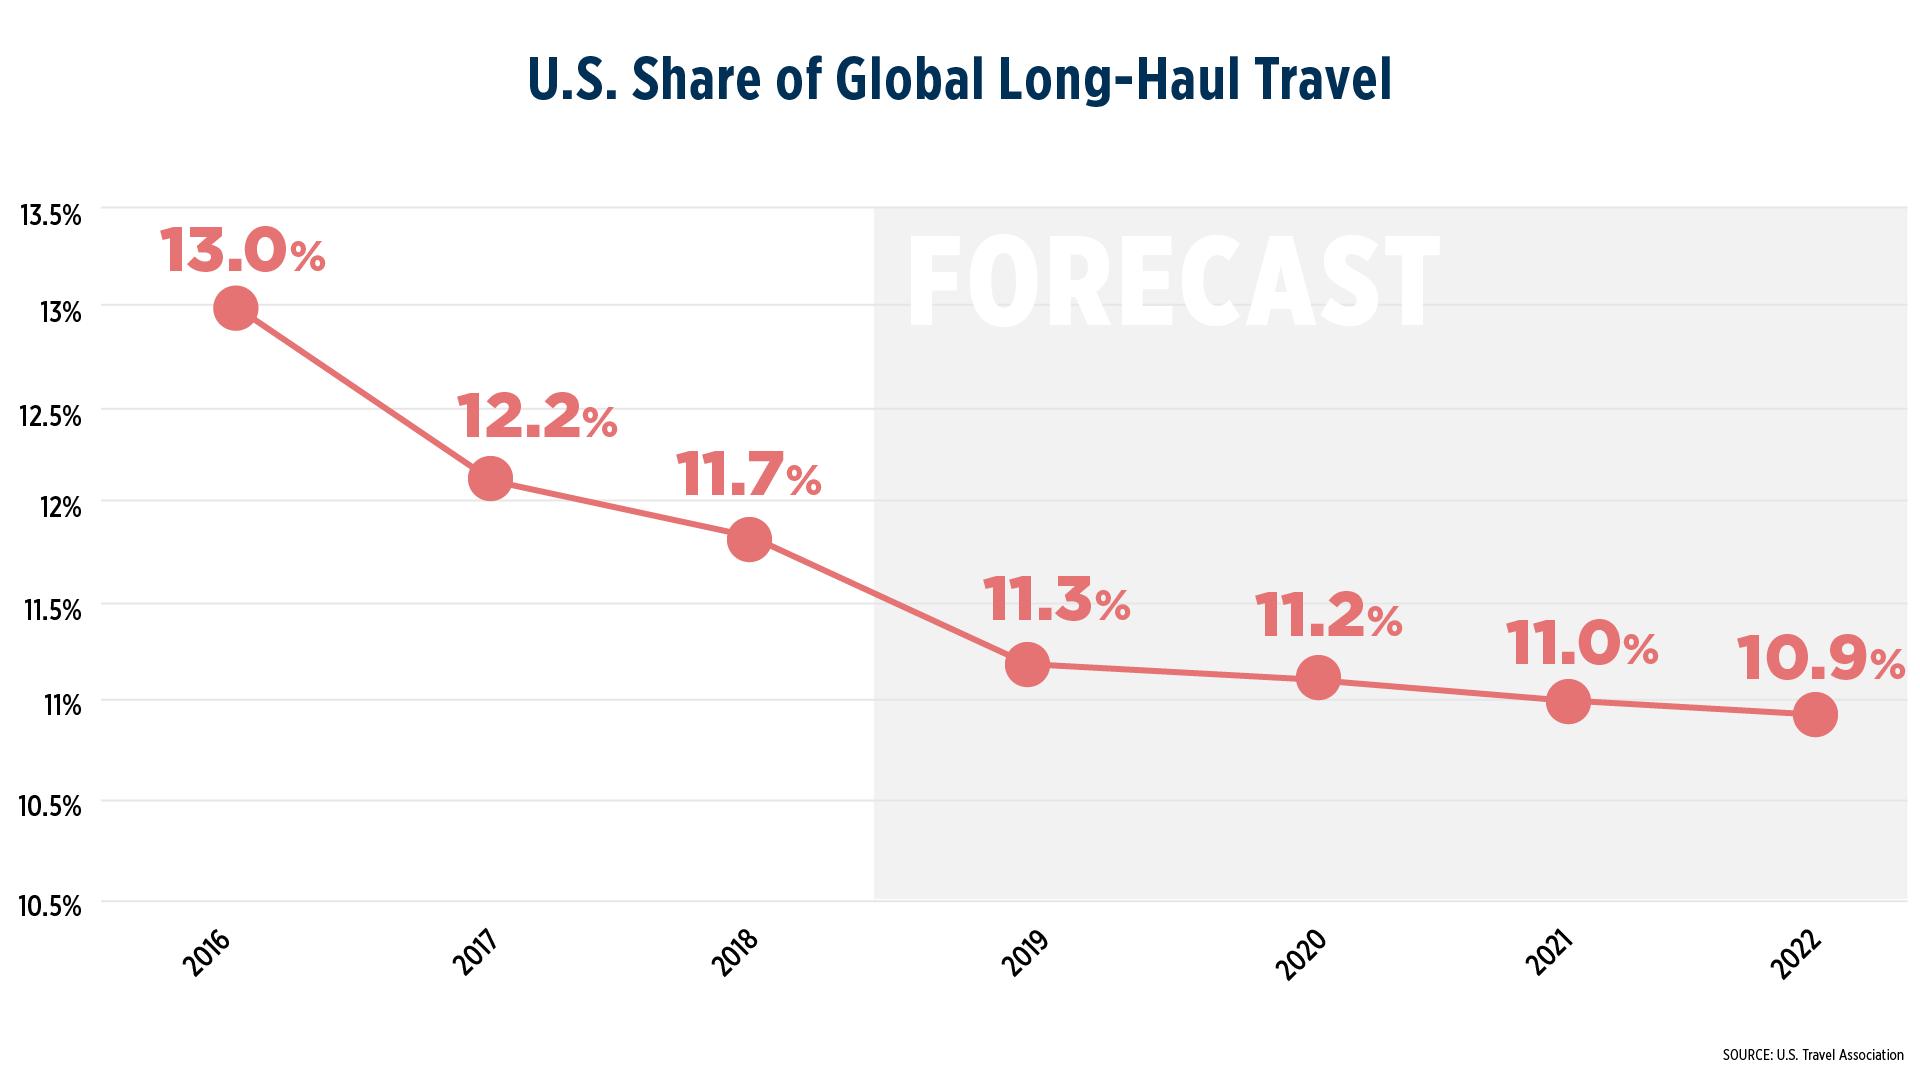 U.S. Share of Long-Haul Travel chart